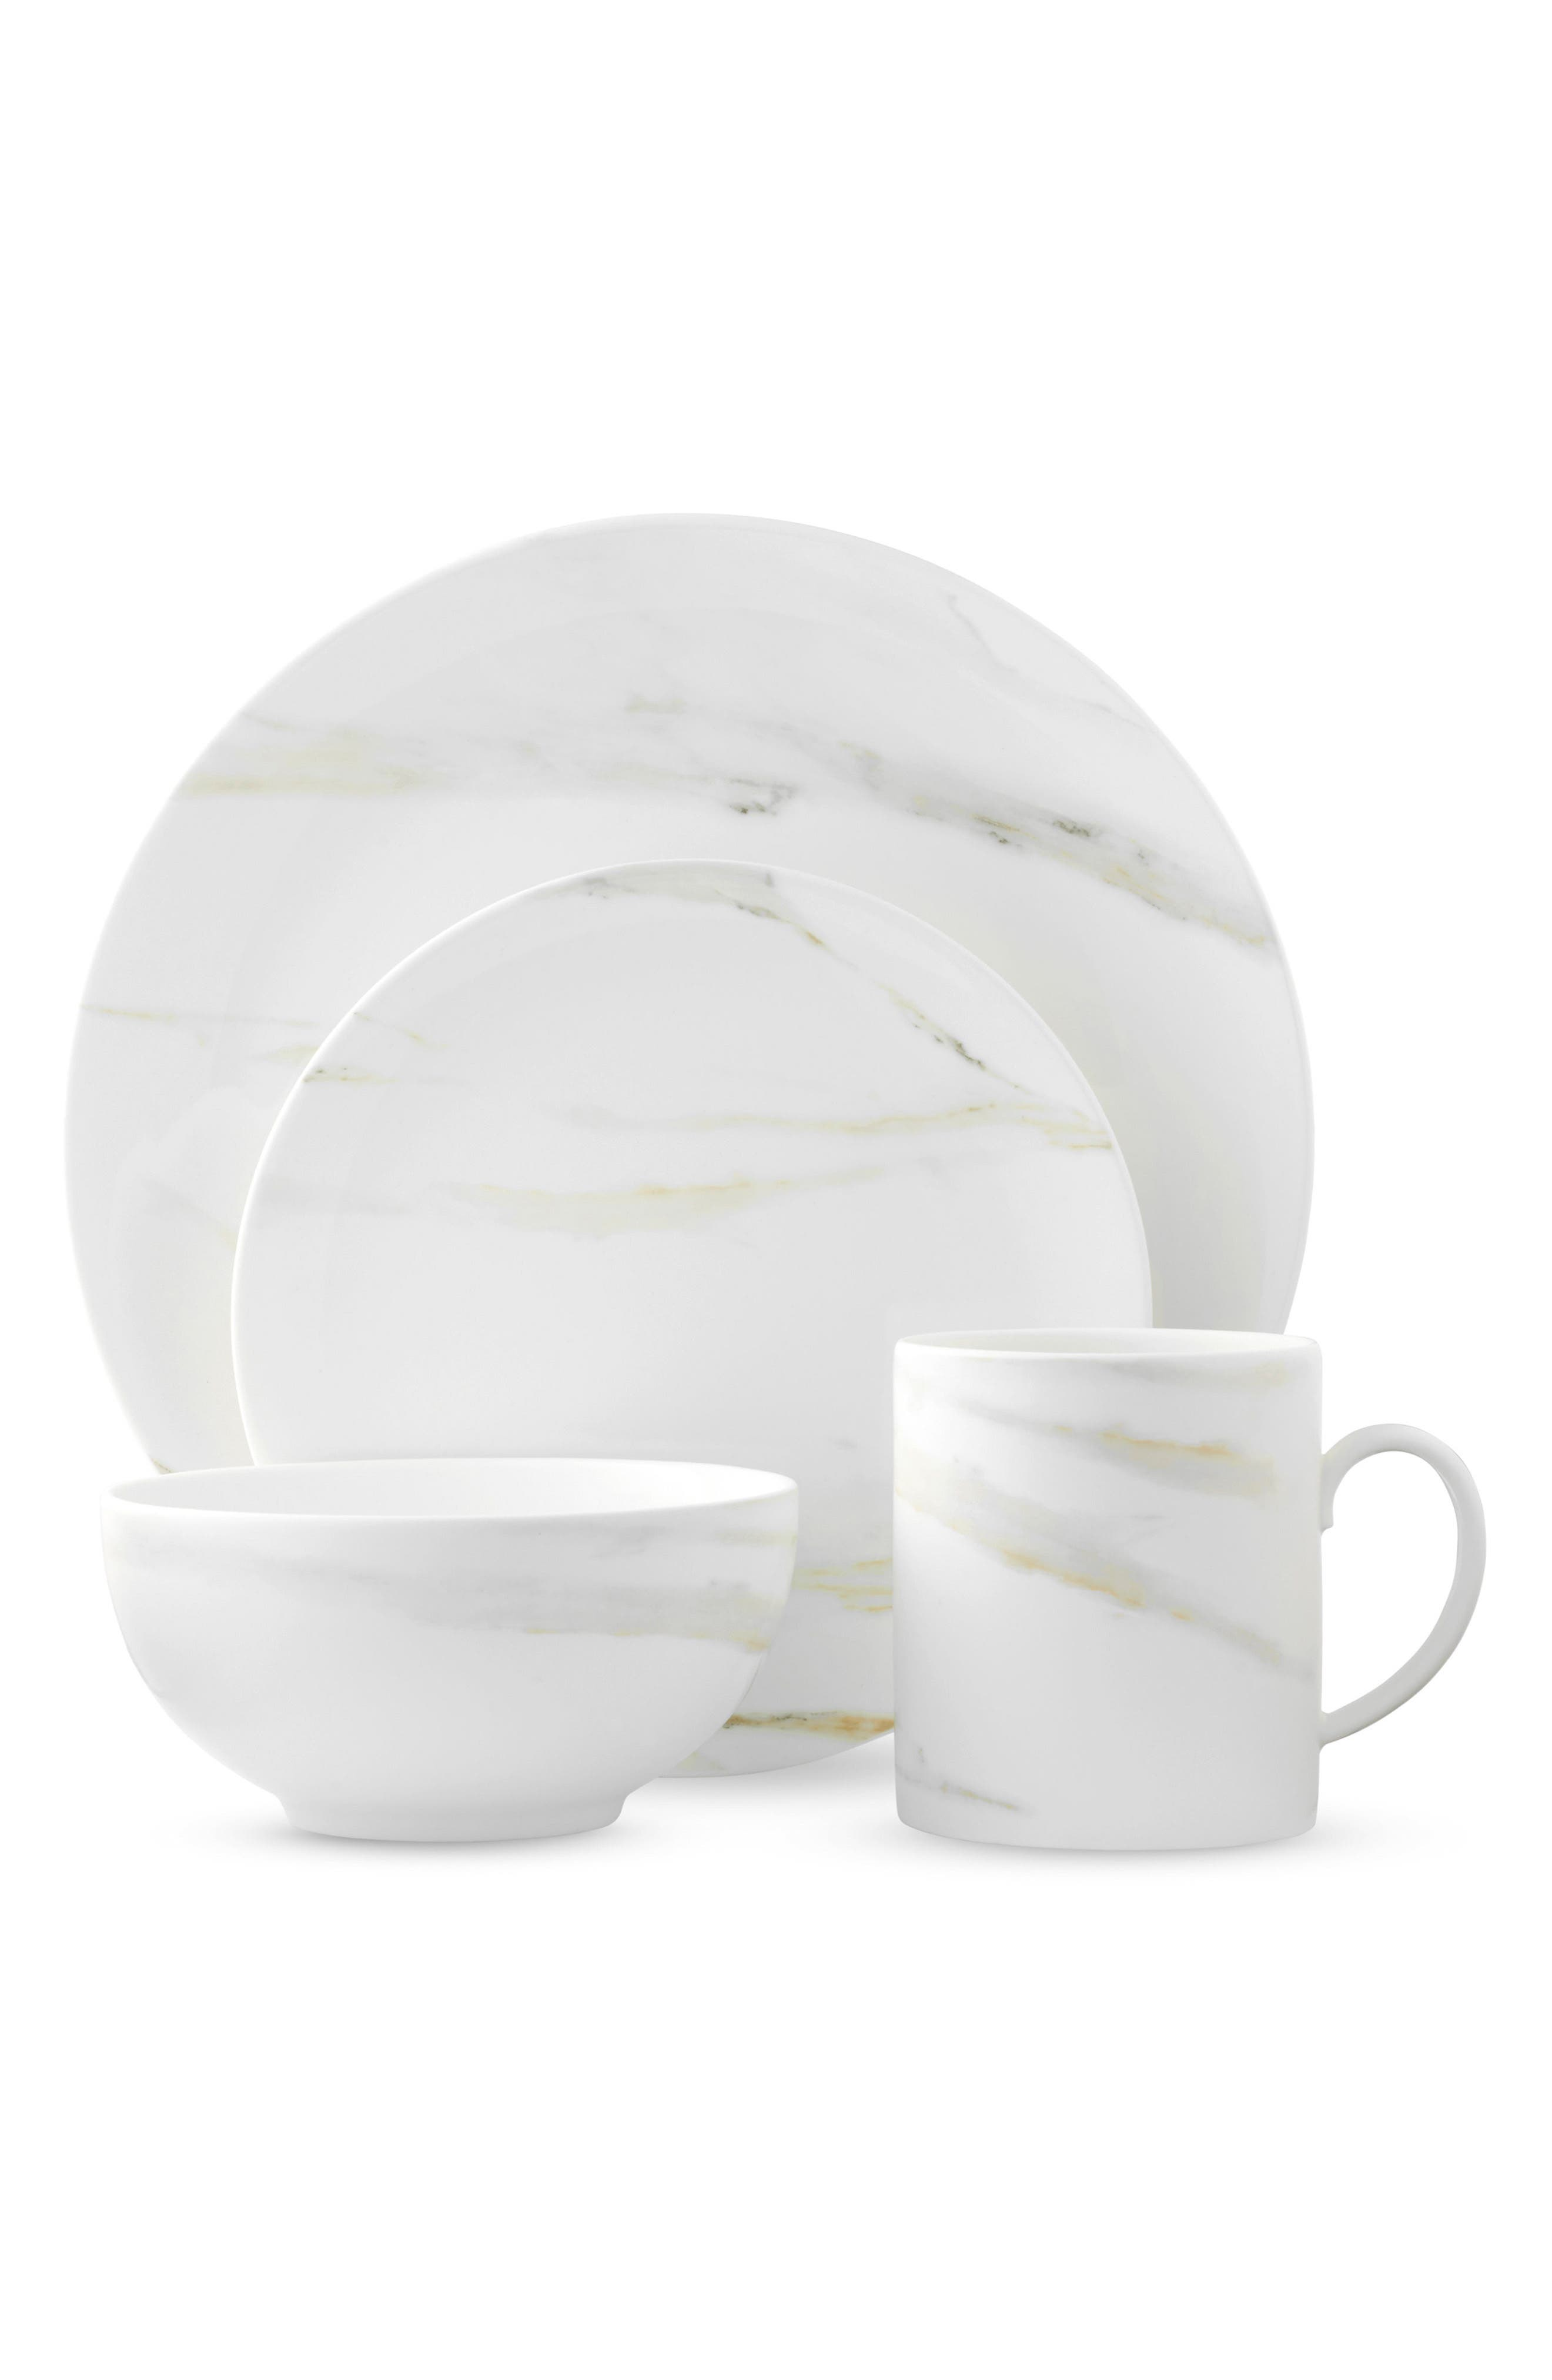 Alternate Image 1 Selected - Vera Wang x Wedgwood Venato Imperial 4-Piece Bone China Dinnerware Place Setting